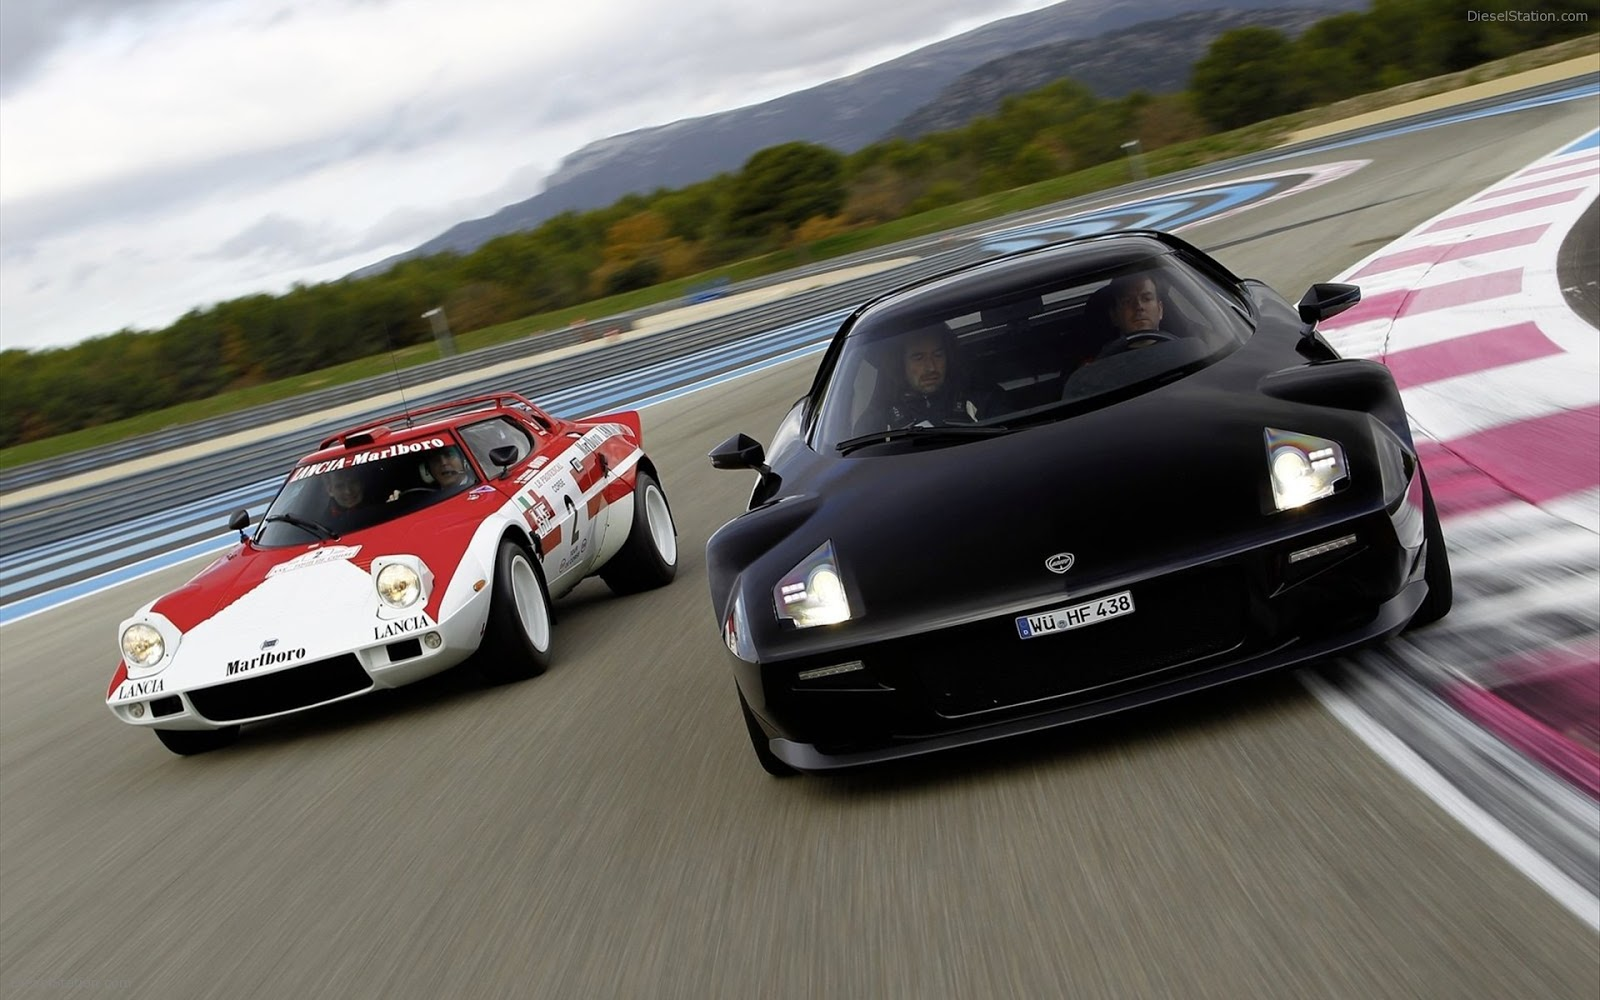 2012-10-17-Lancia-Stratos-13-(carwalls.blogspot.com)